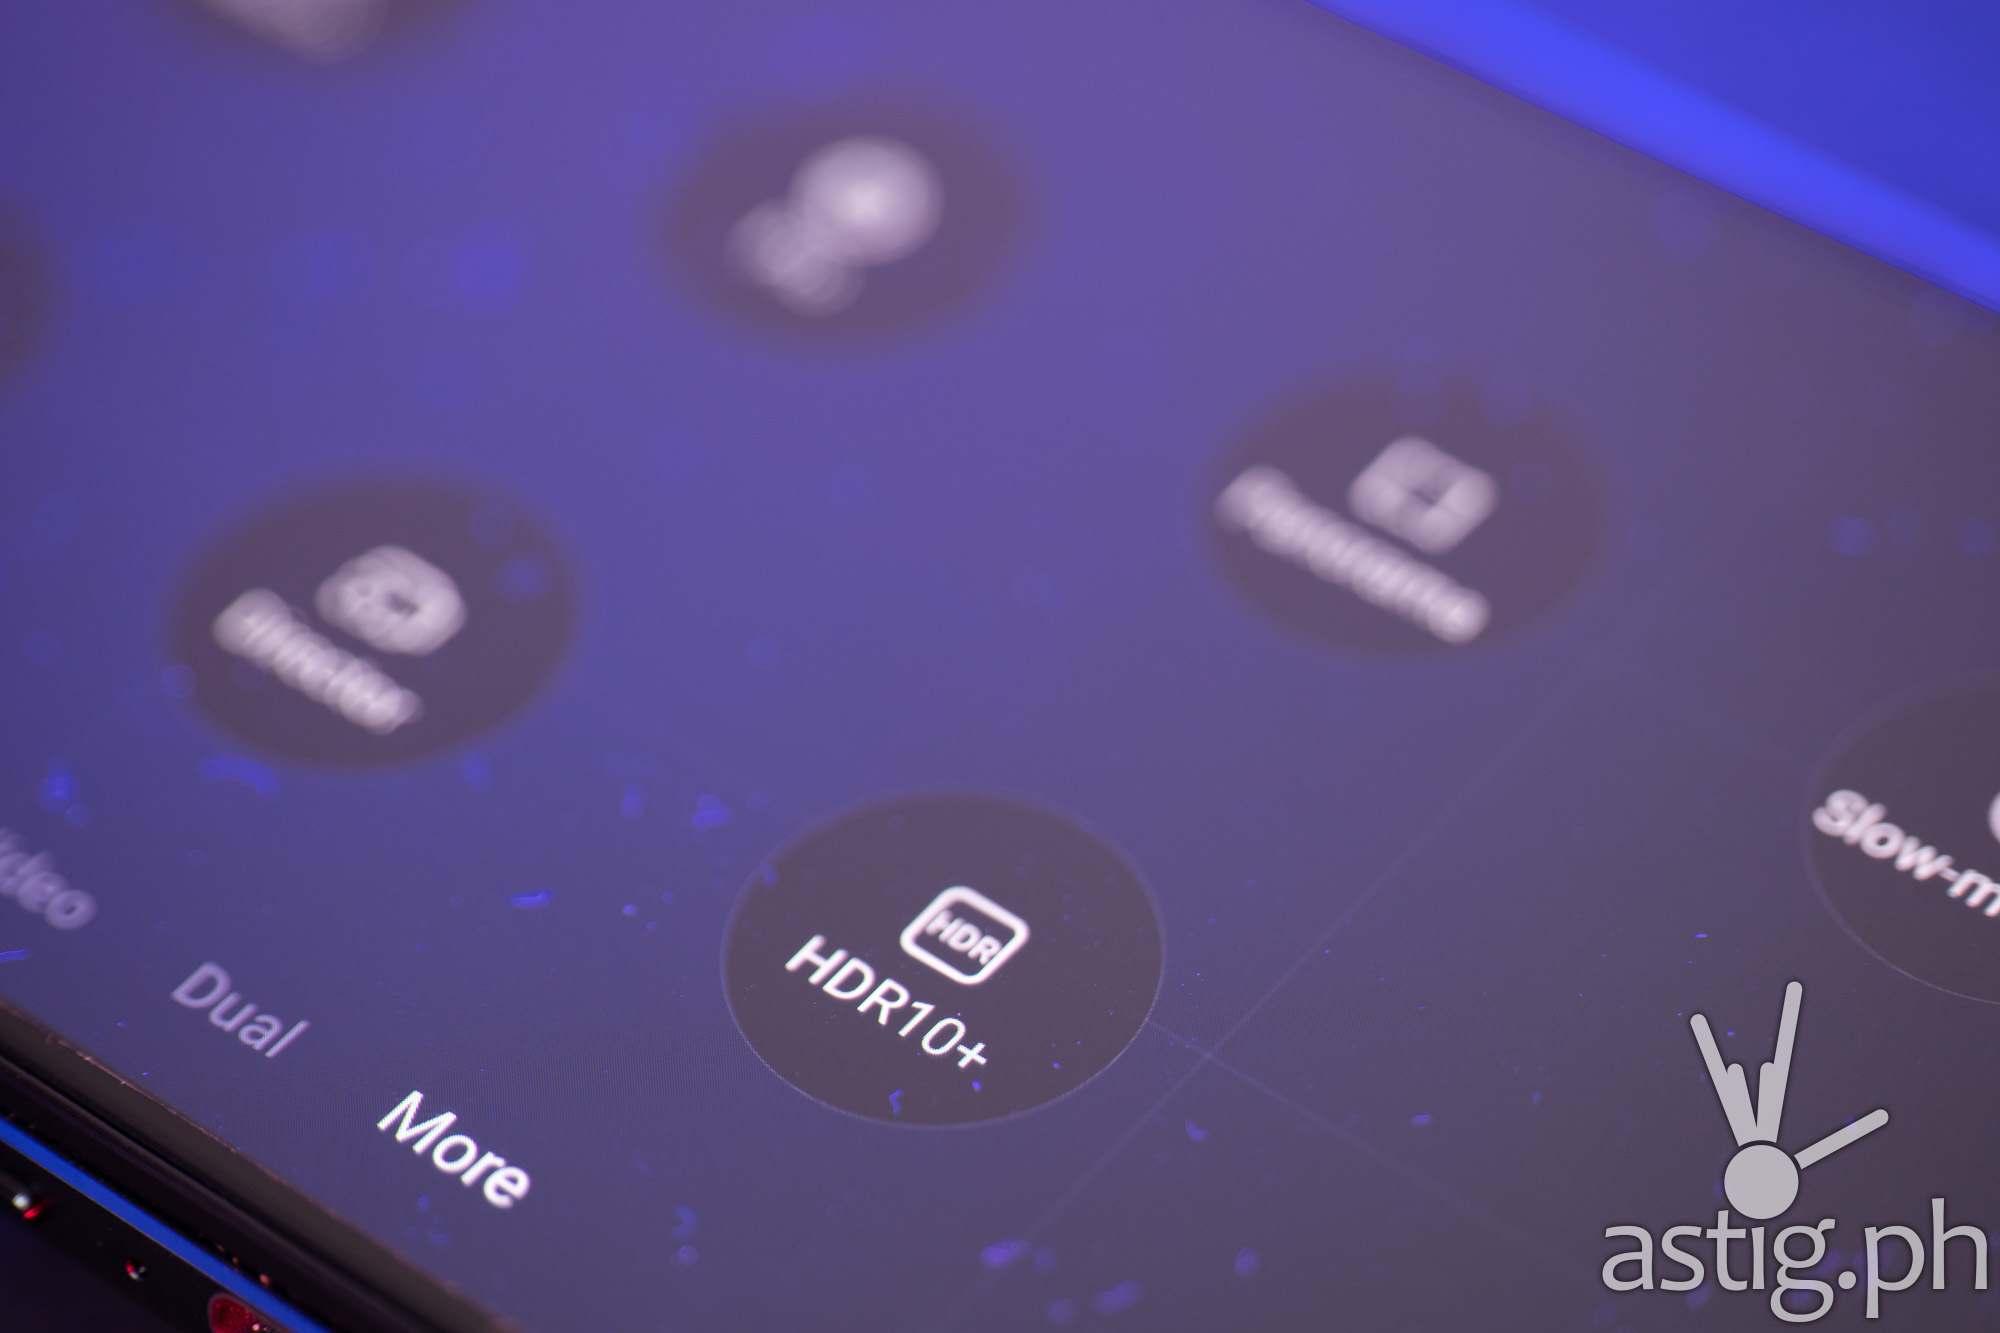 Camera settings - Legion Phone Duel 2 (Philippines)